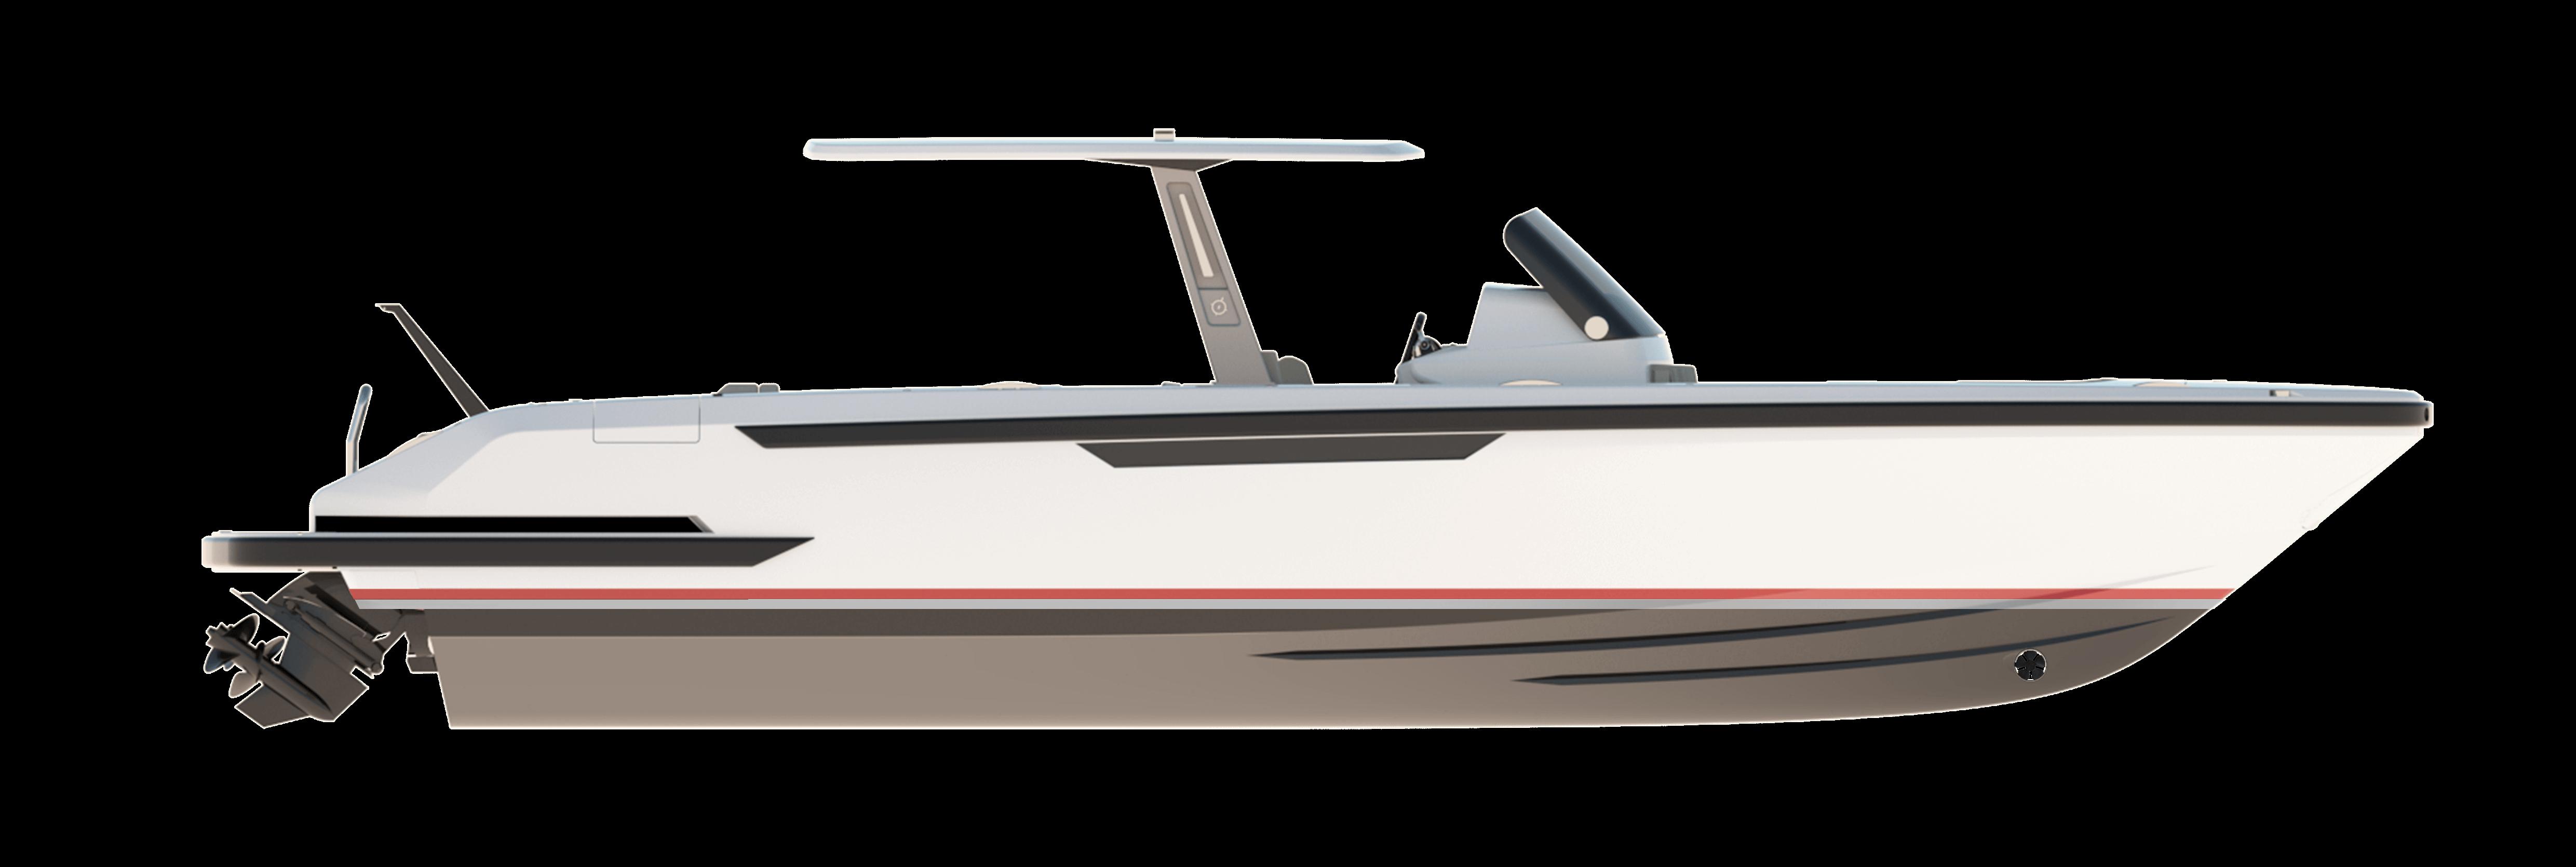 Compass Tenders limo tender yot profile